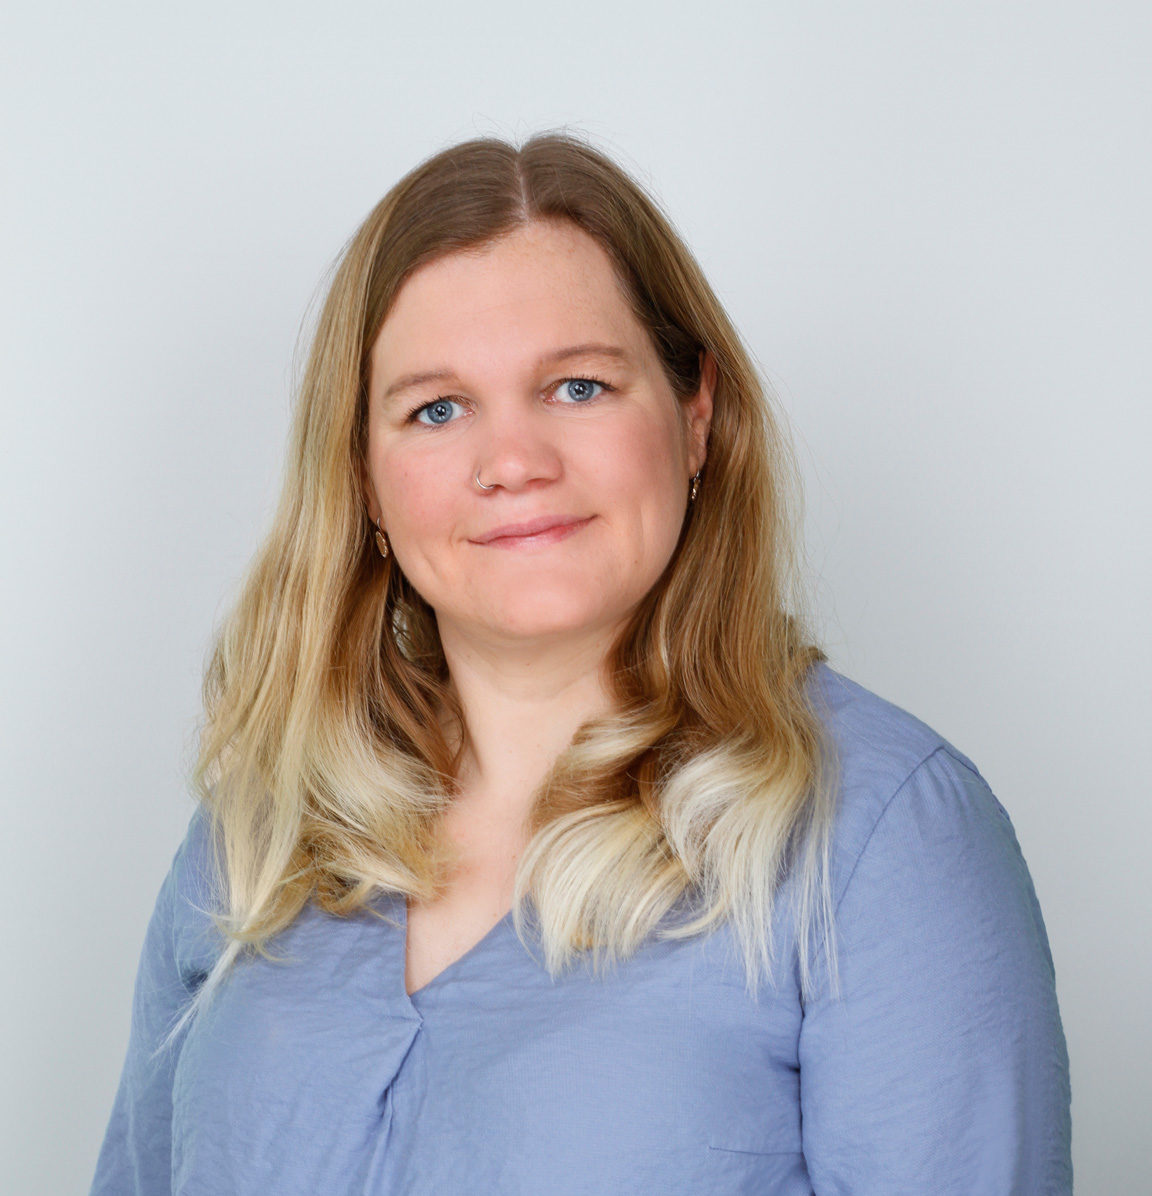 Samantha Härter